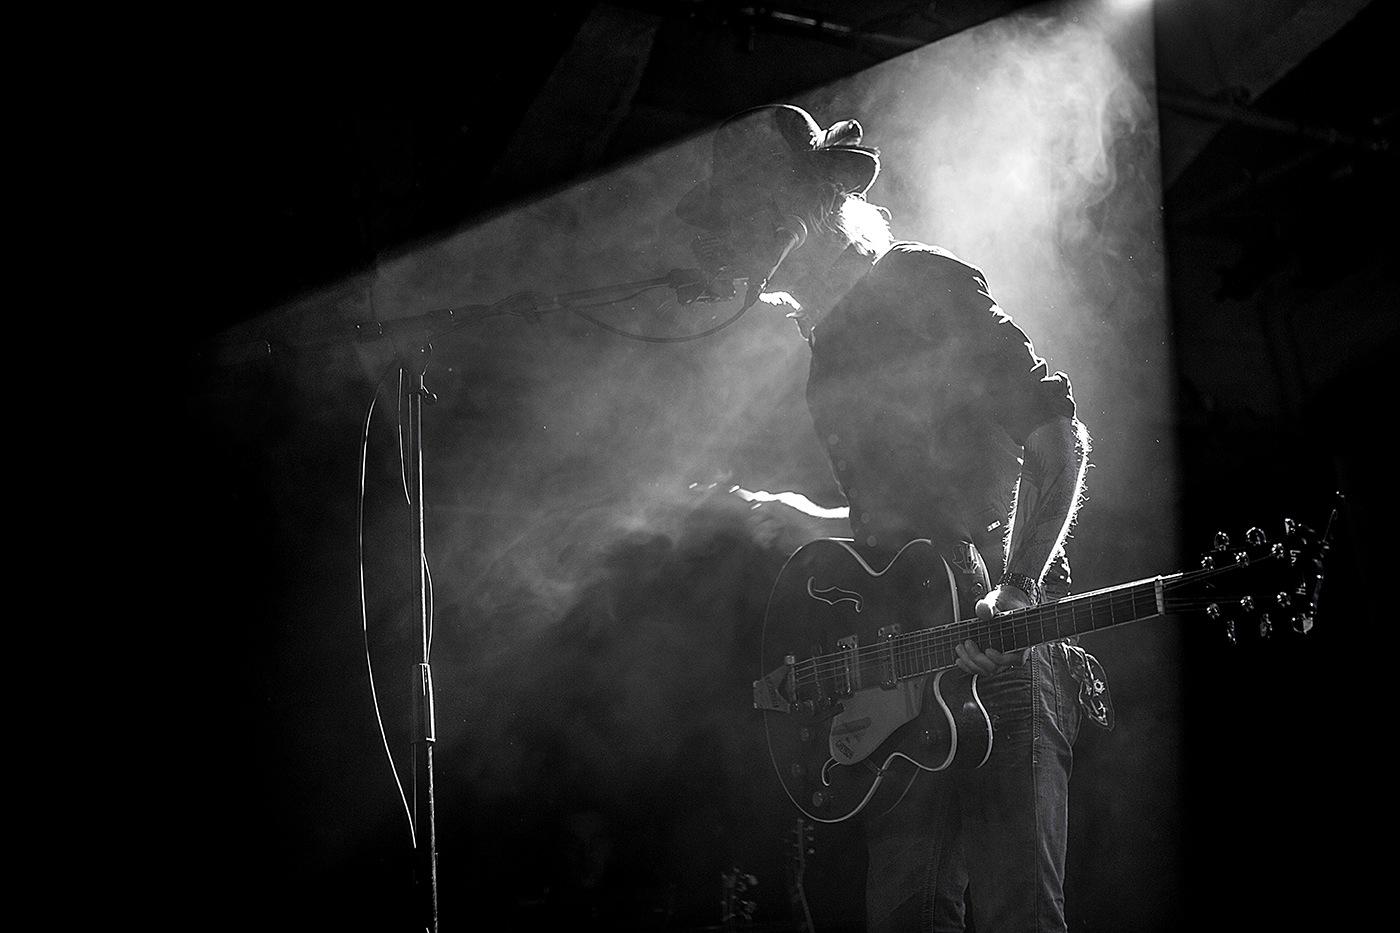 David Eugene Edwards (N&B, projecteur), Wovenhand - Les nuits de l'Alligator